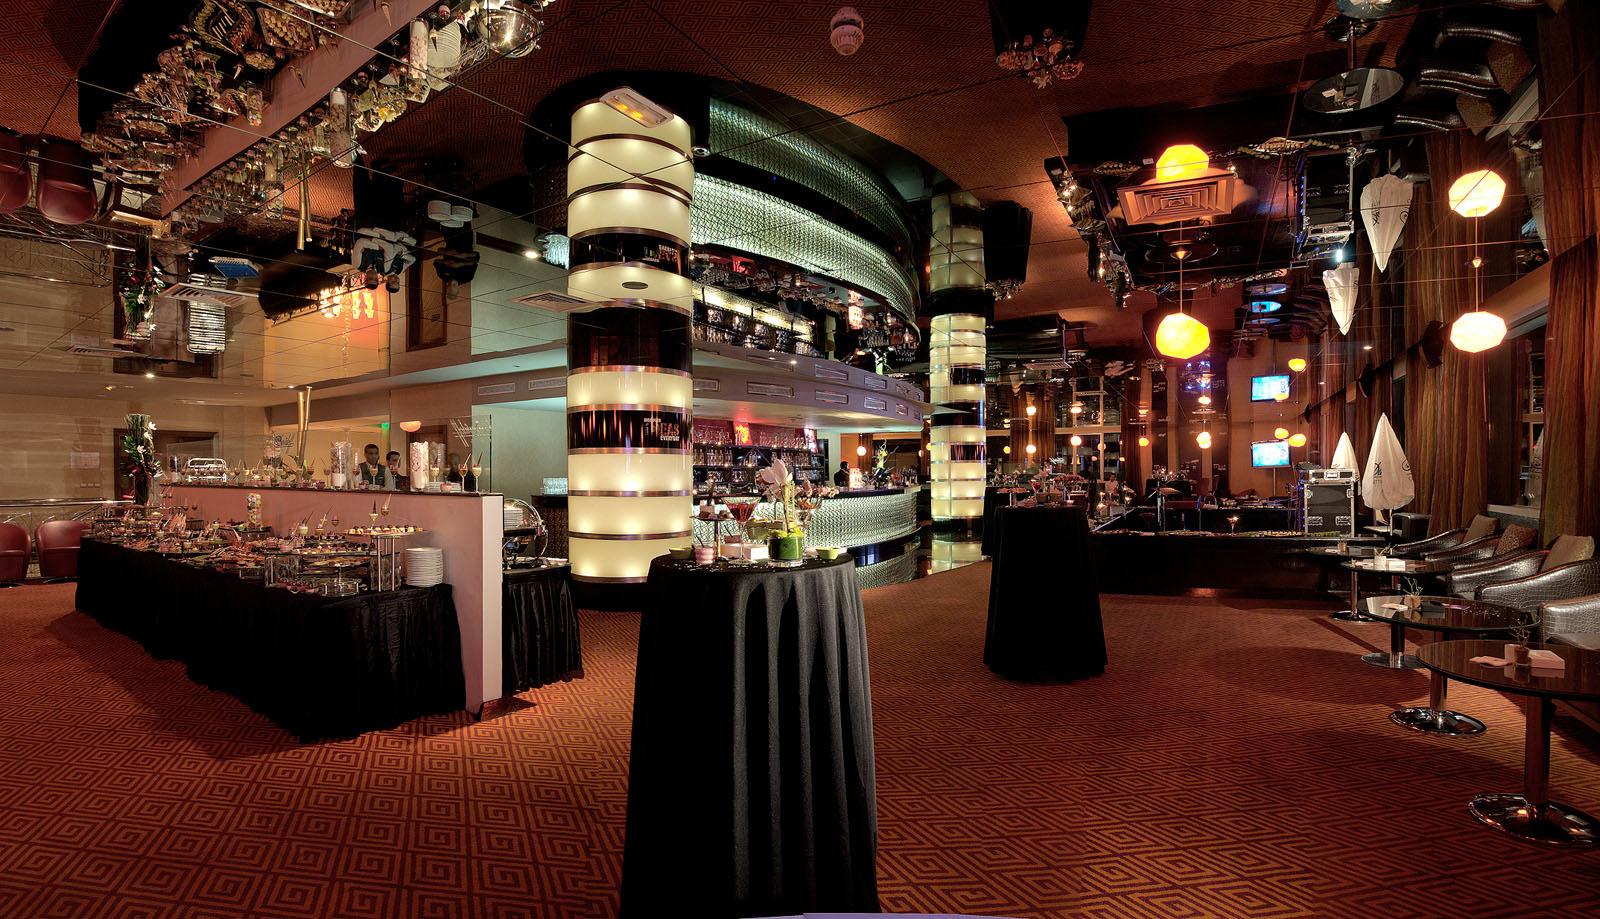 Sky 28 Bar at Kenzi Tower Hotel in central Casablanca, Morocco